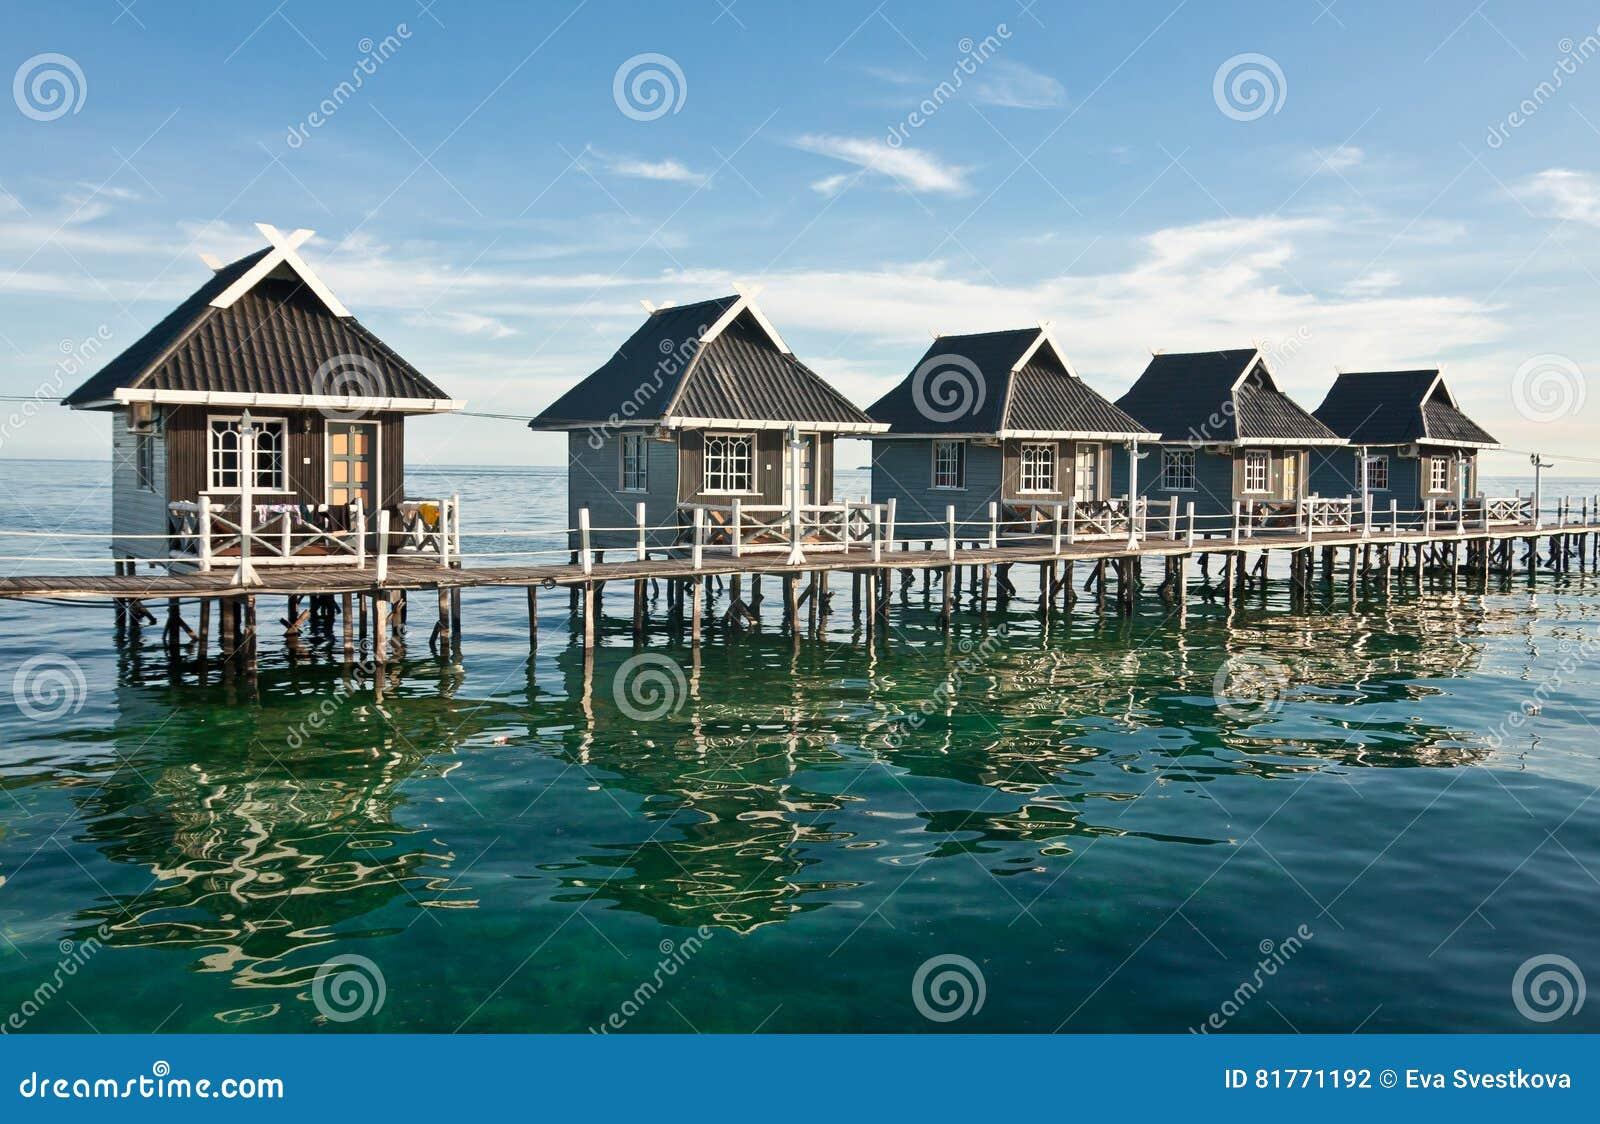 Water Houses On Mabul Island Borneo Sabah Malaysia